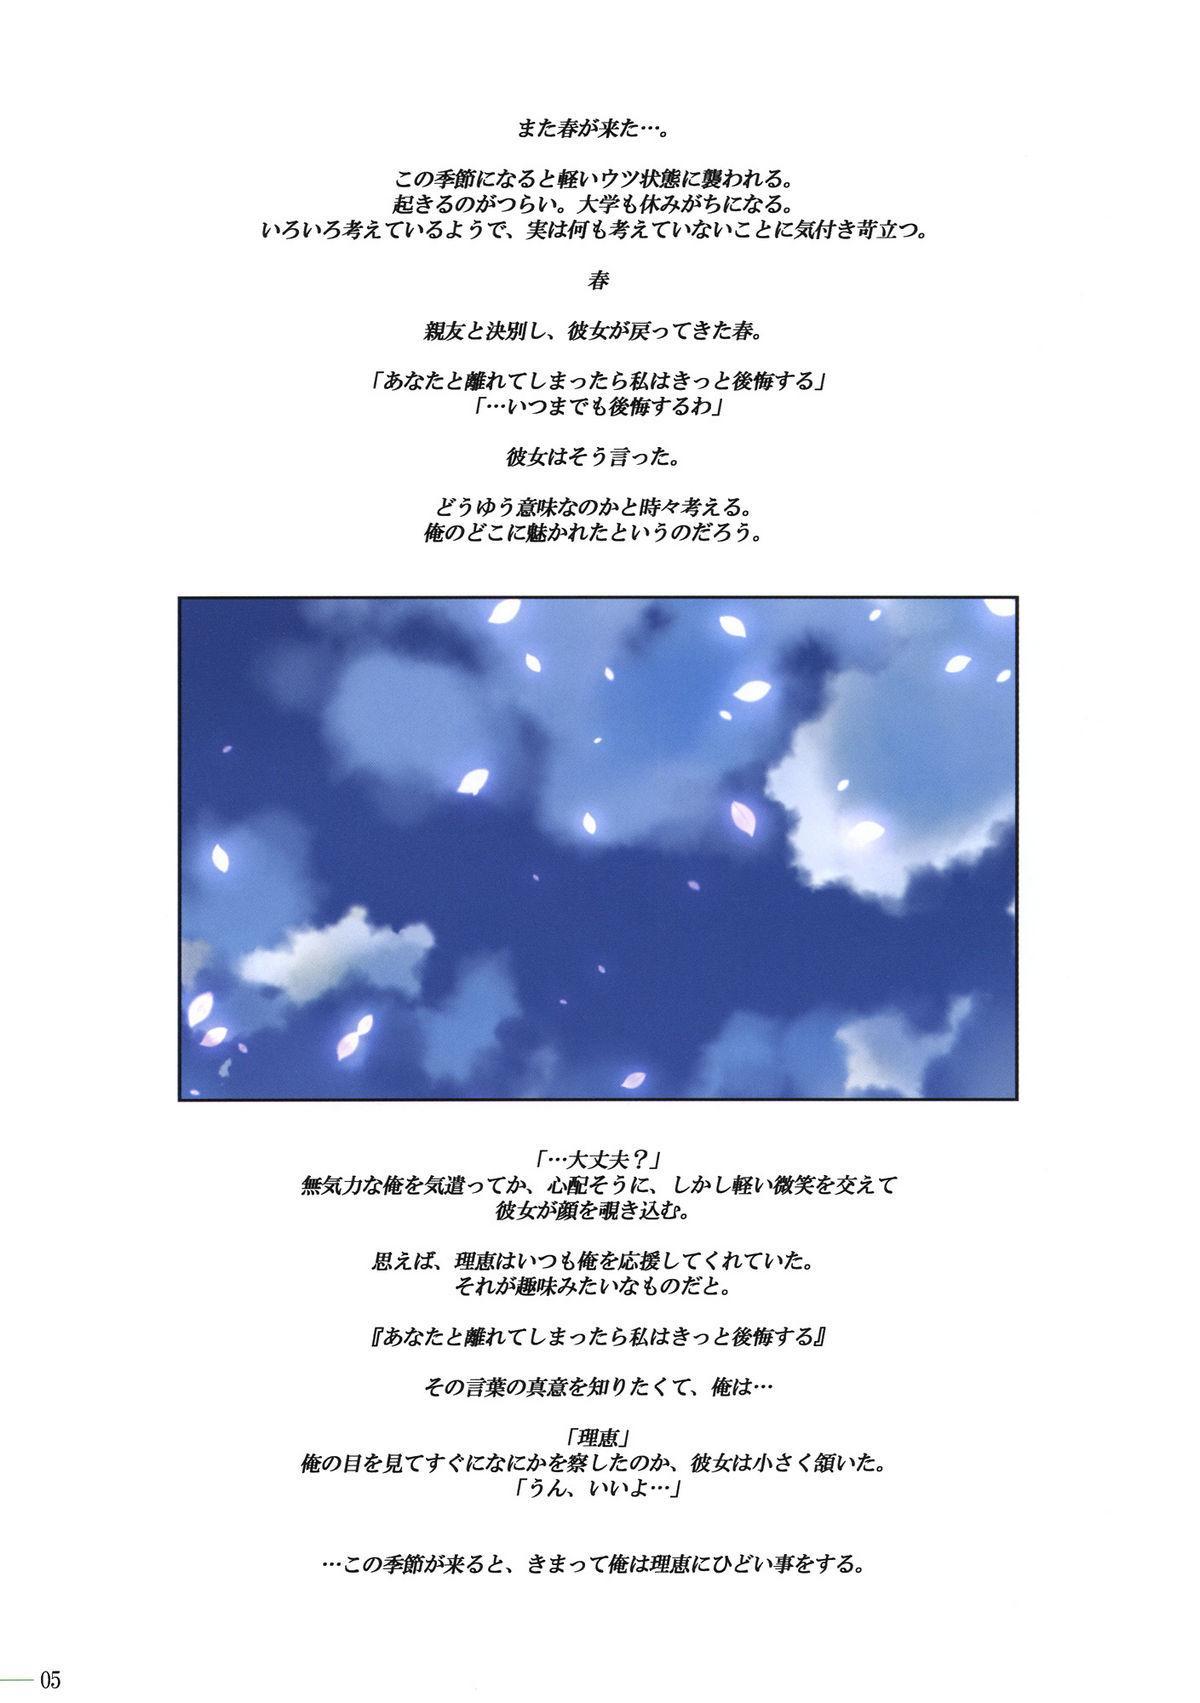 (C77) [Makino Jimusho (Taki Minashika)] LOVERS ~Koi ni Ochitara... ~Blindo LOVERS ~she is everything I need she is everything I'm not~ SIDE:A 3